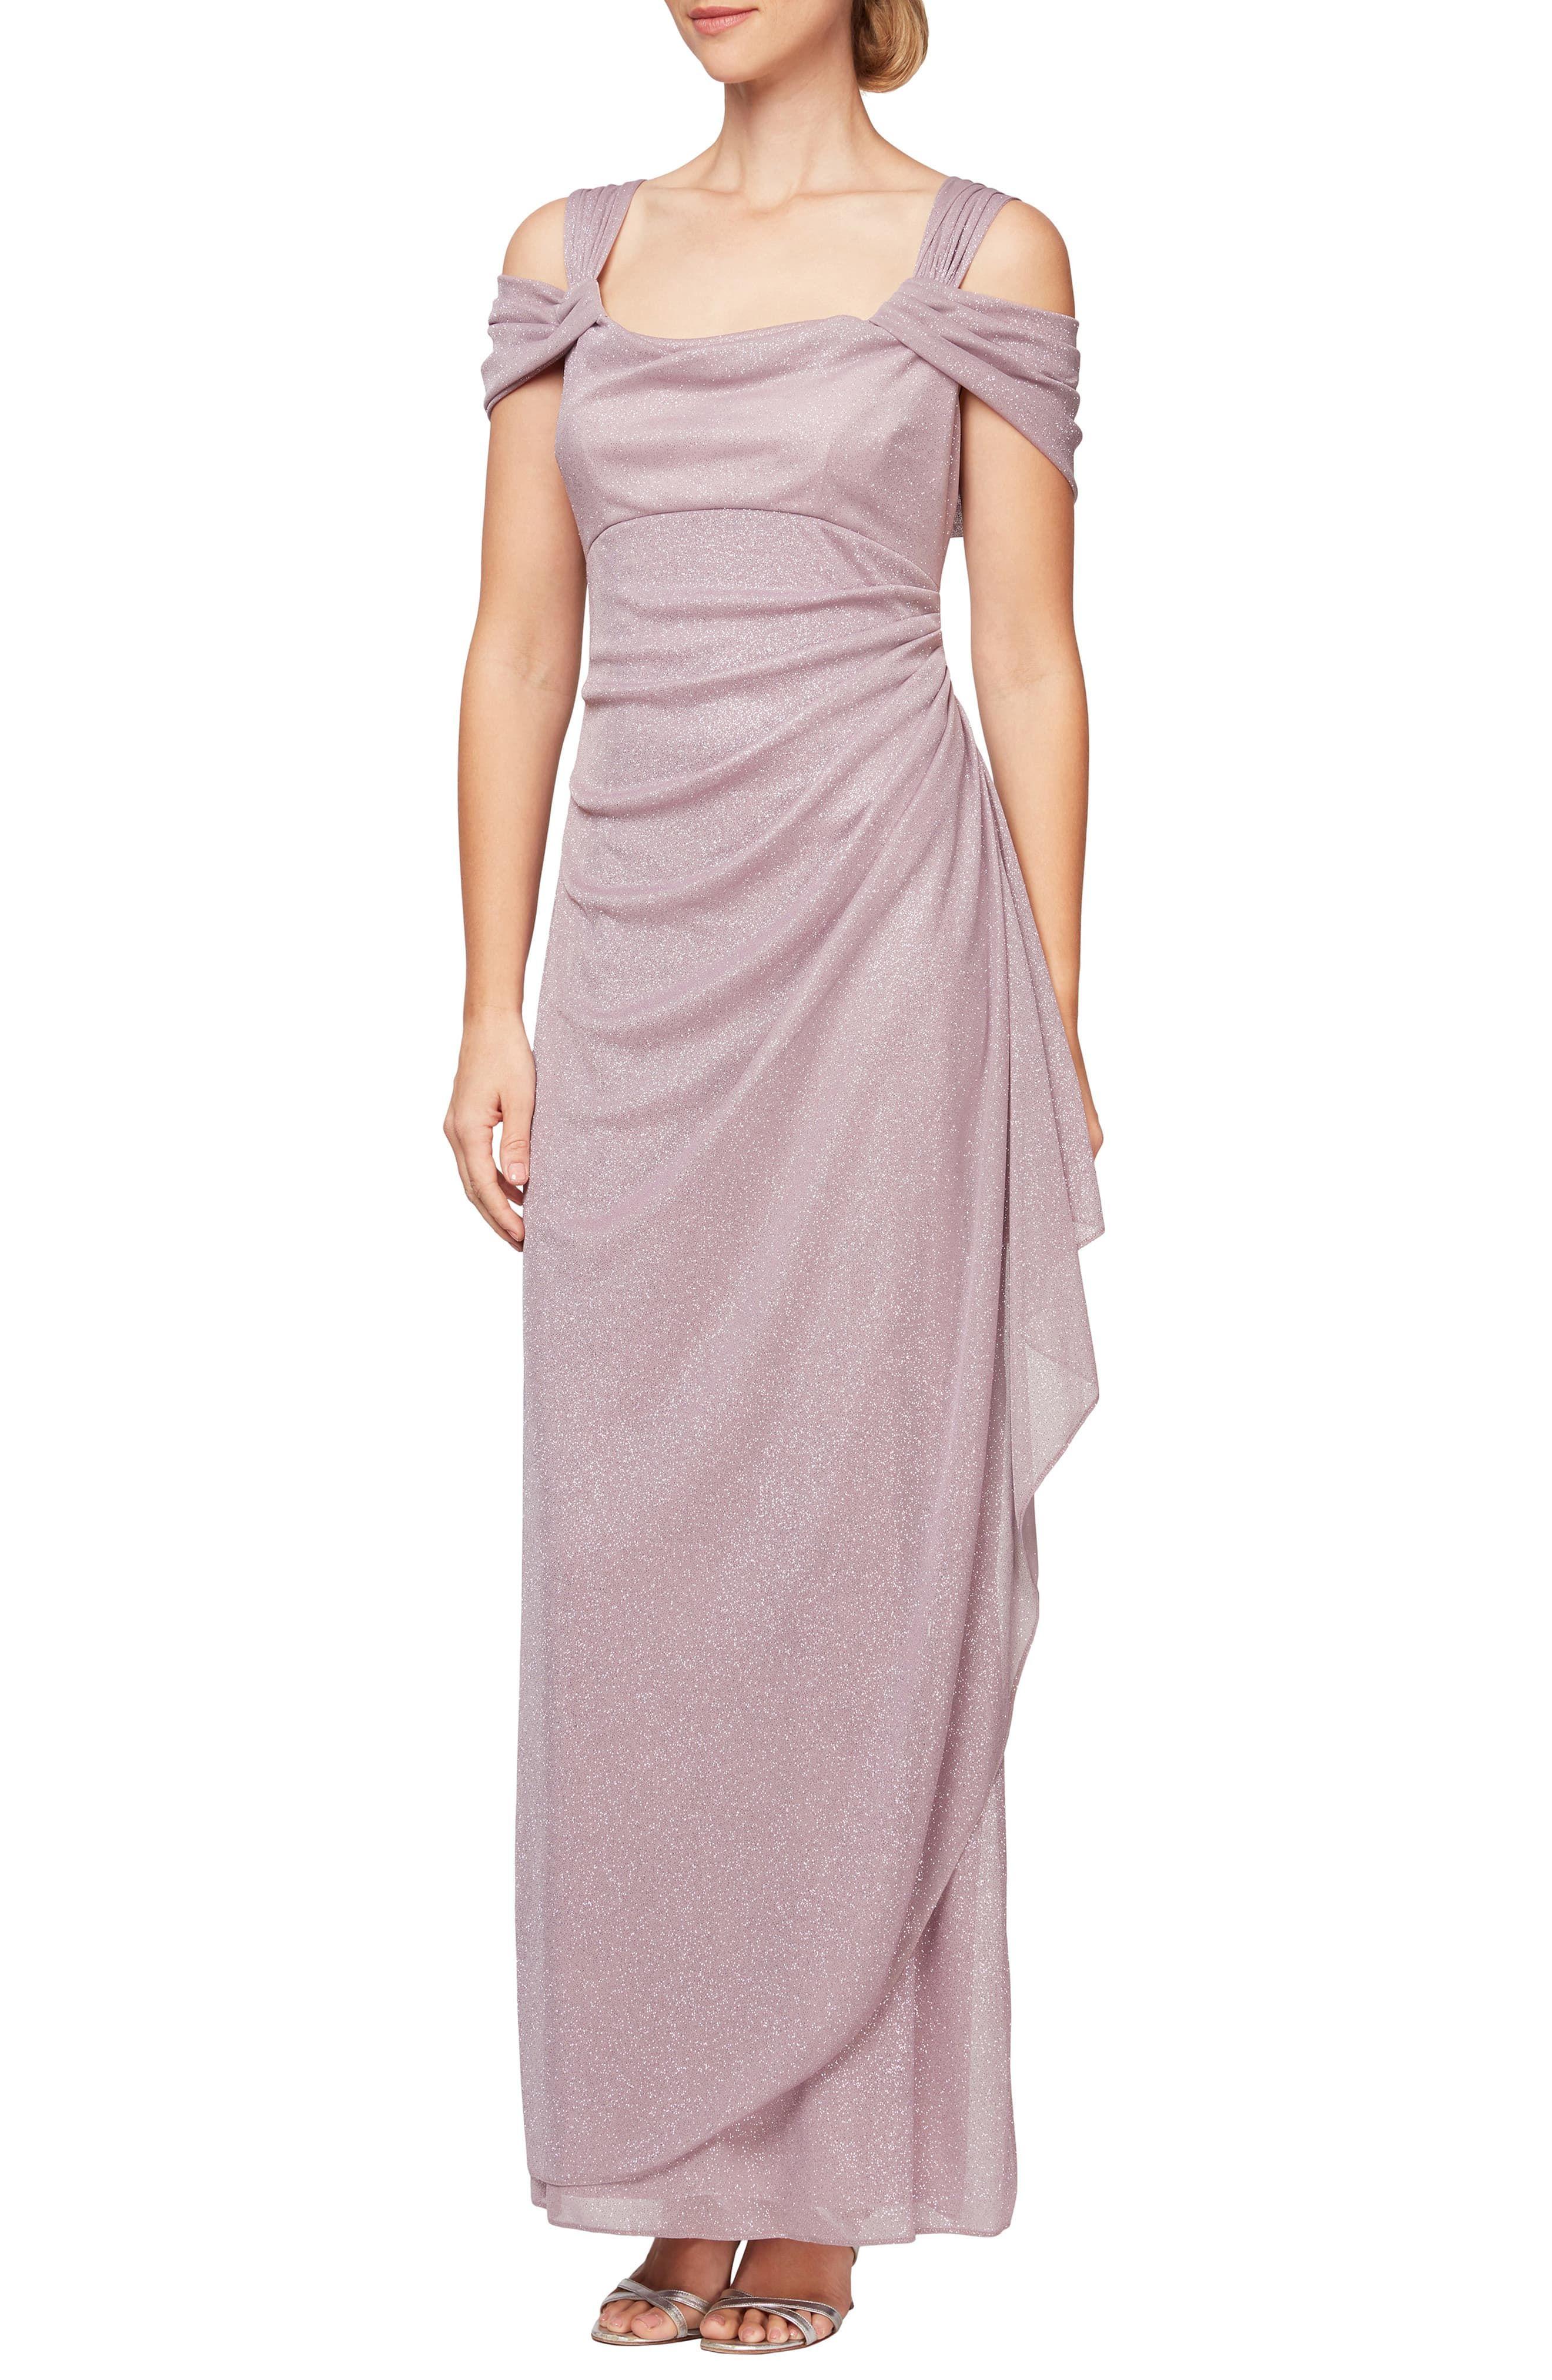 Women S Alex Evenings Cold Shoulder Ruffle Glitter Gown Size 8 Pink In 2021 Cold Shoulder Gown Women Long Sleeve Dress Long Sleeve Casual Dress [ 4048 x 2640 Pixel ]